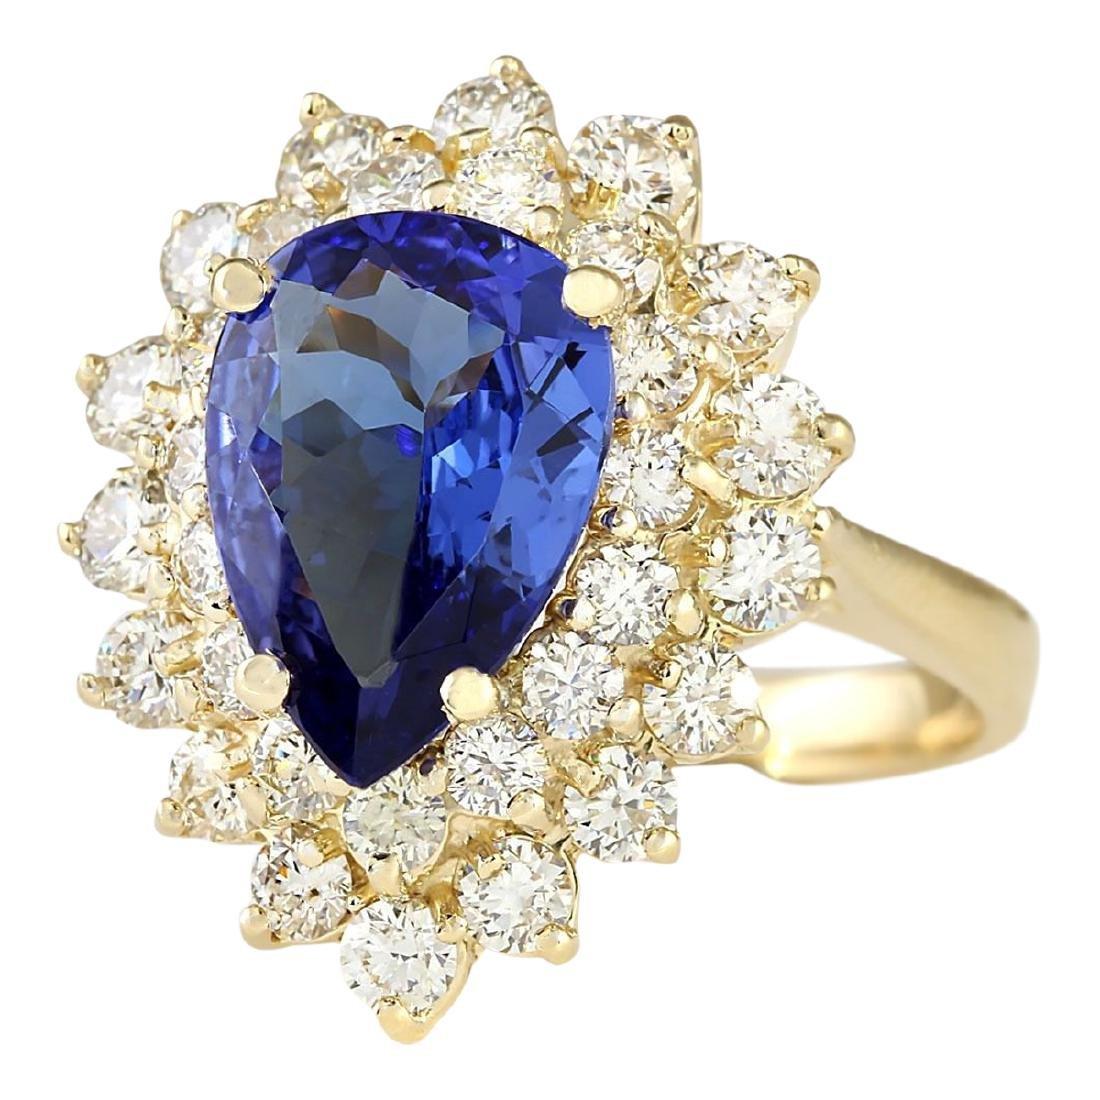 4.73 CTW Natural Blue Tanzanite And Diamond Ring 18K - 2